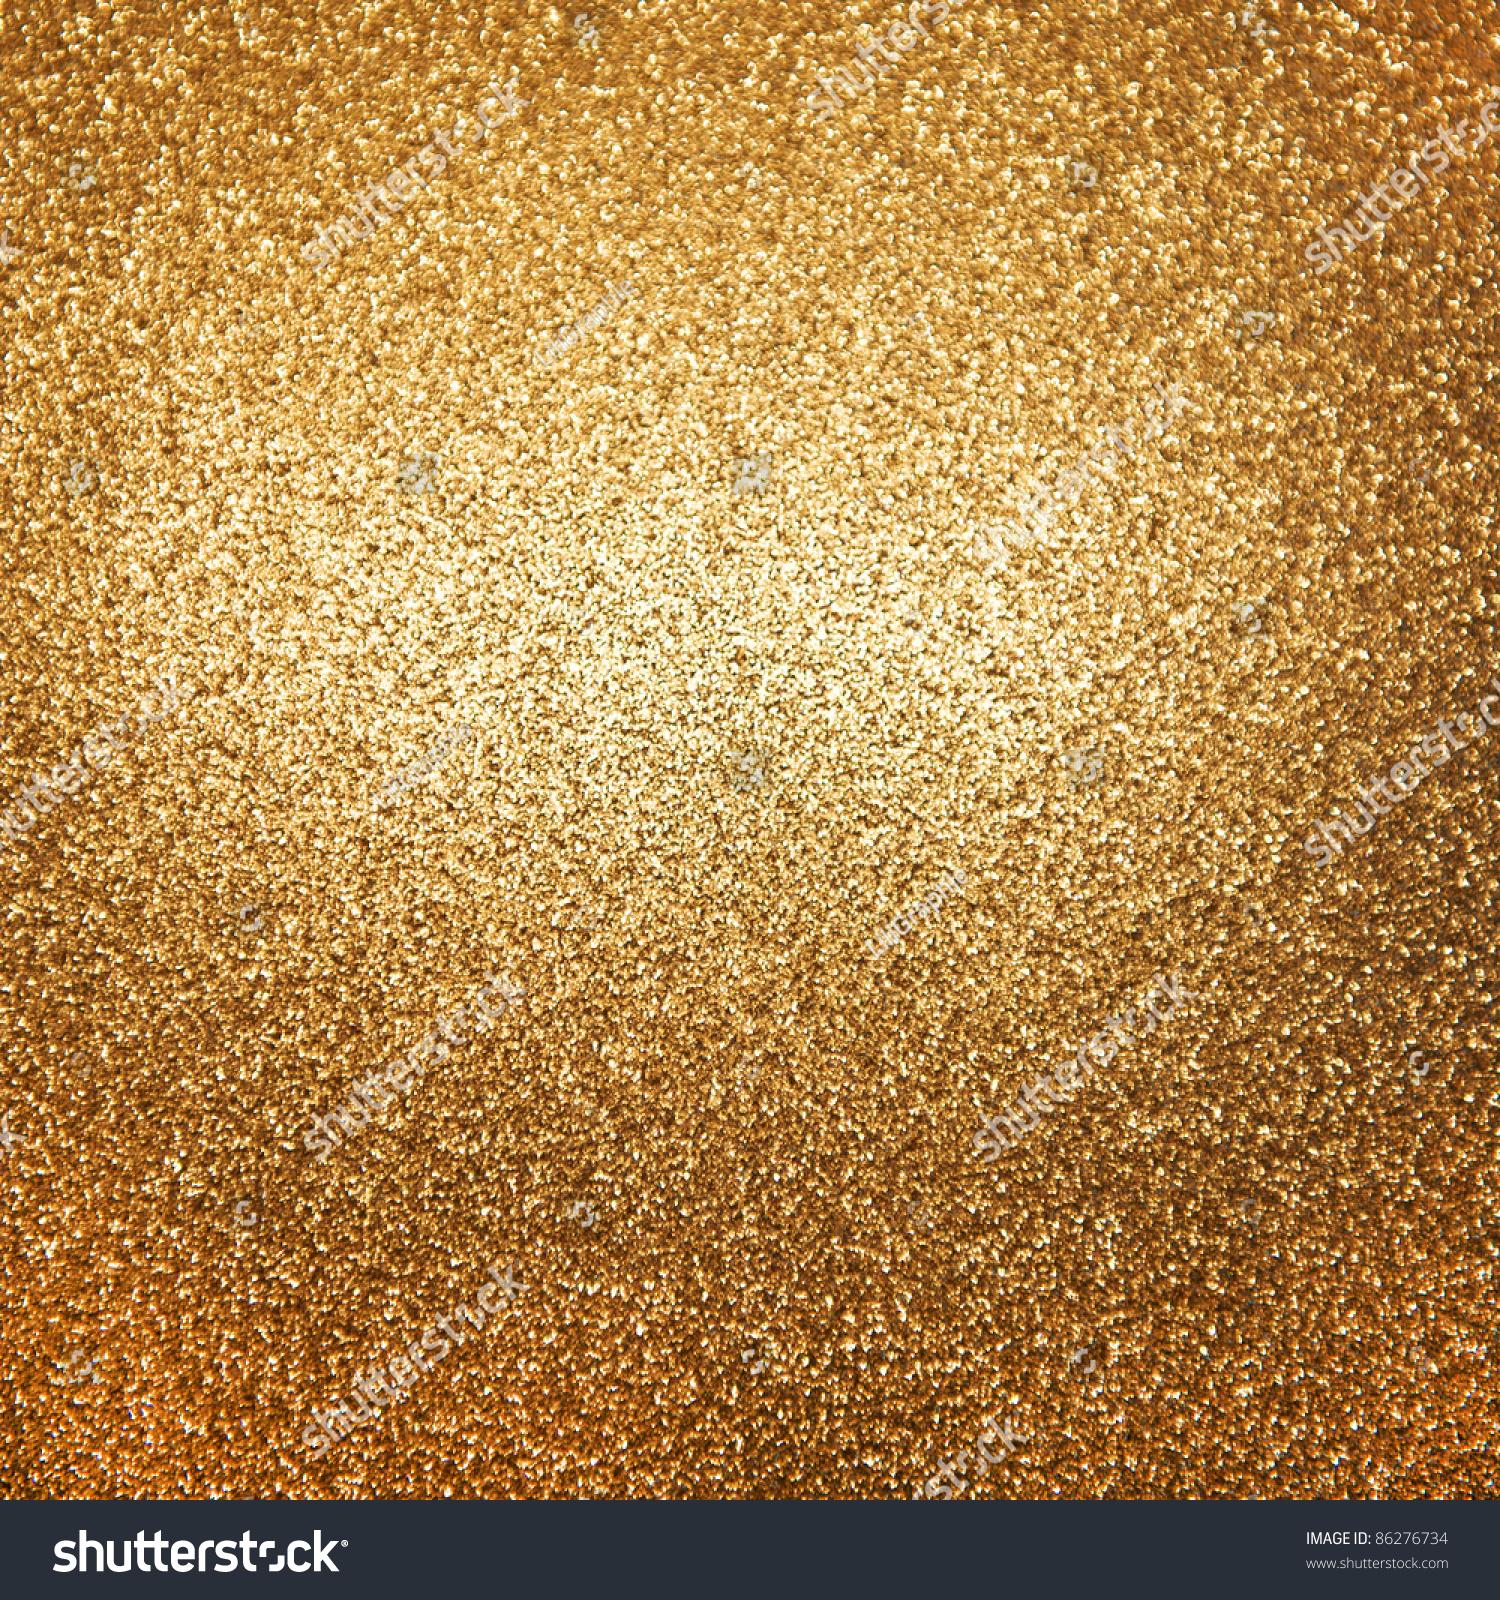 shiny golden lights stock - photo #5